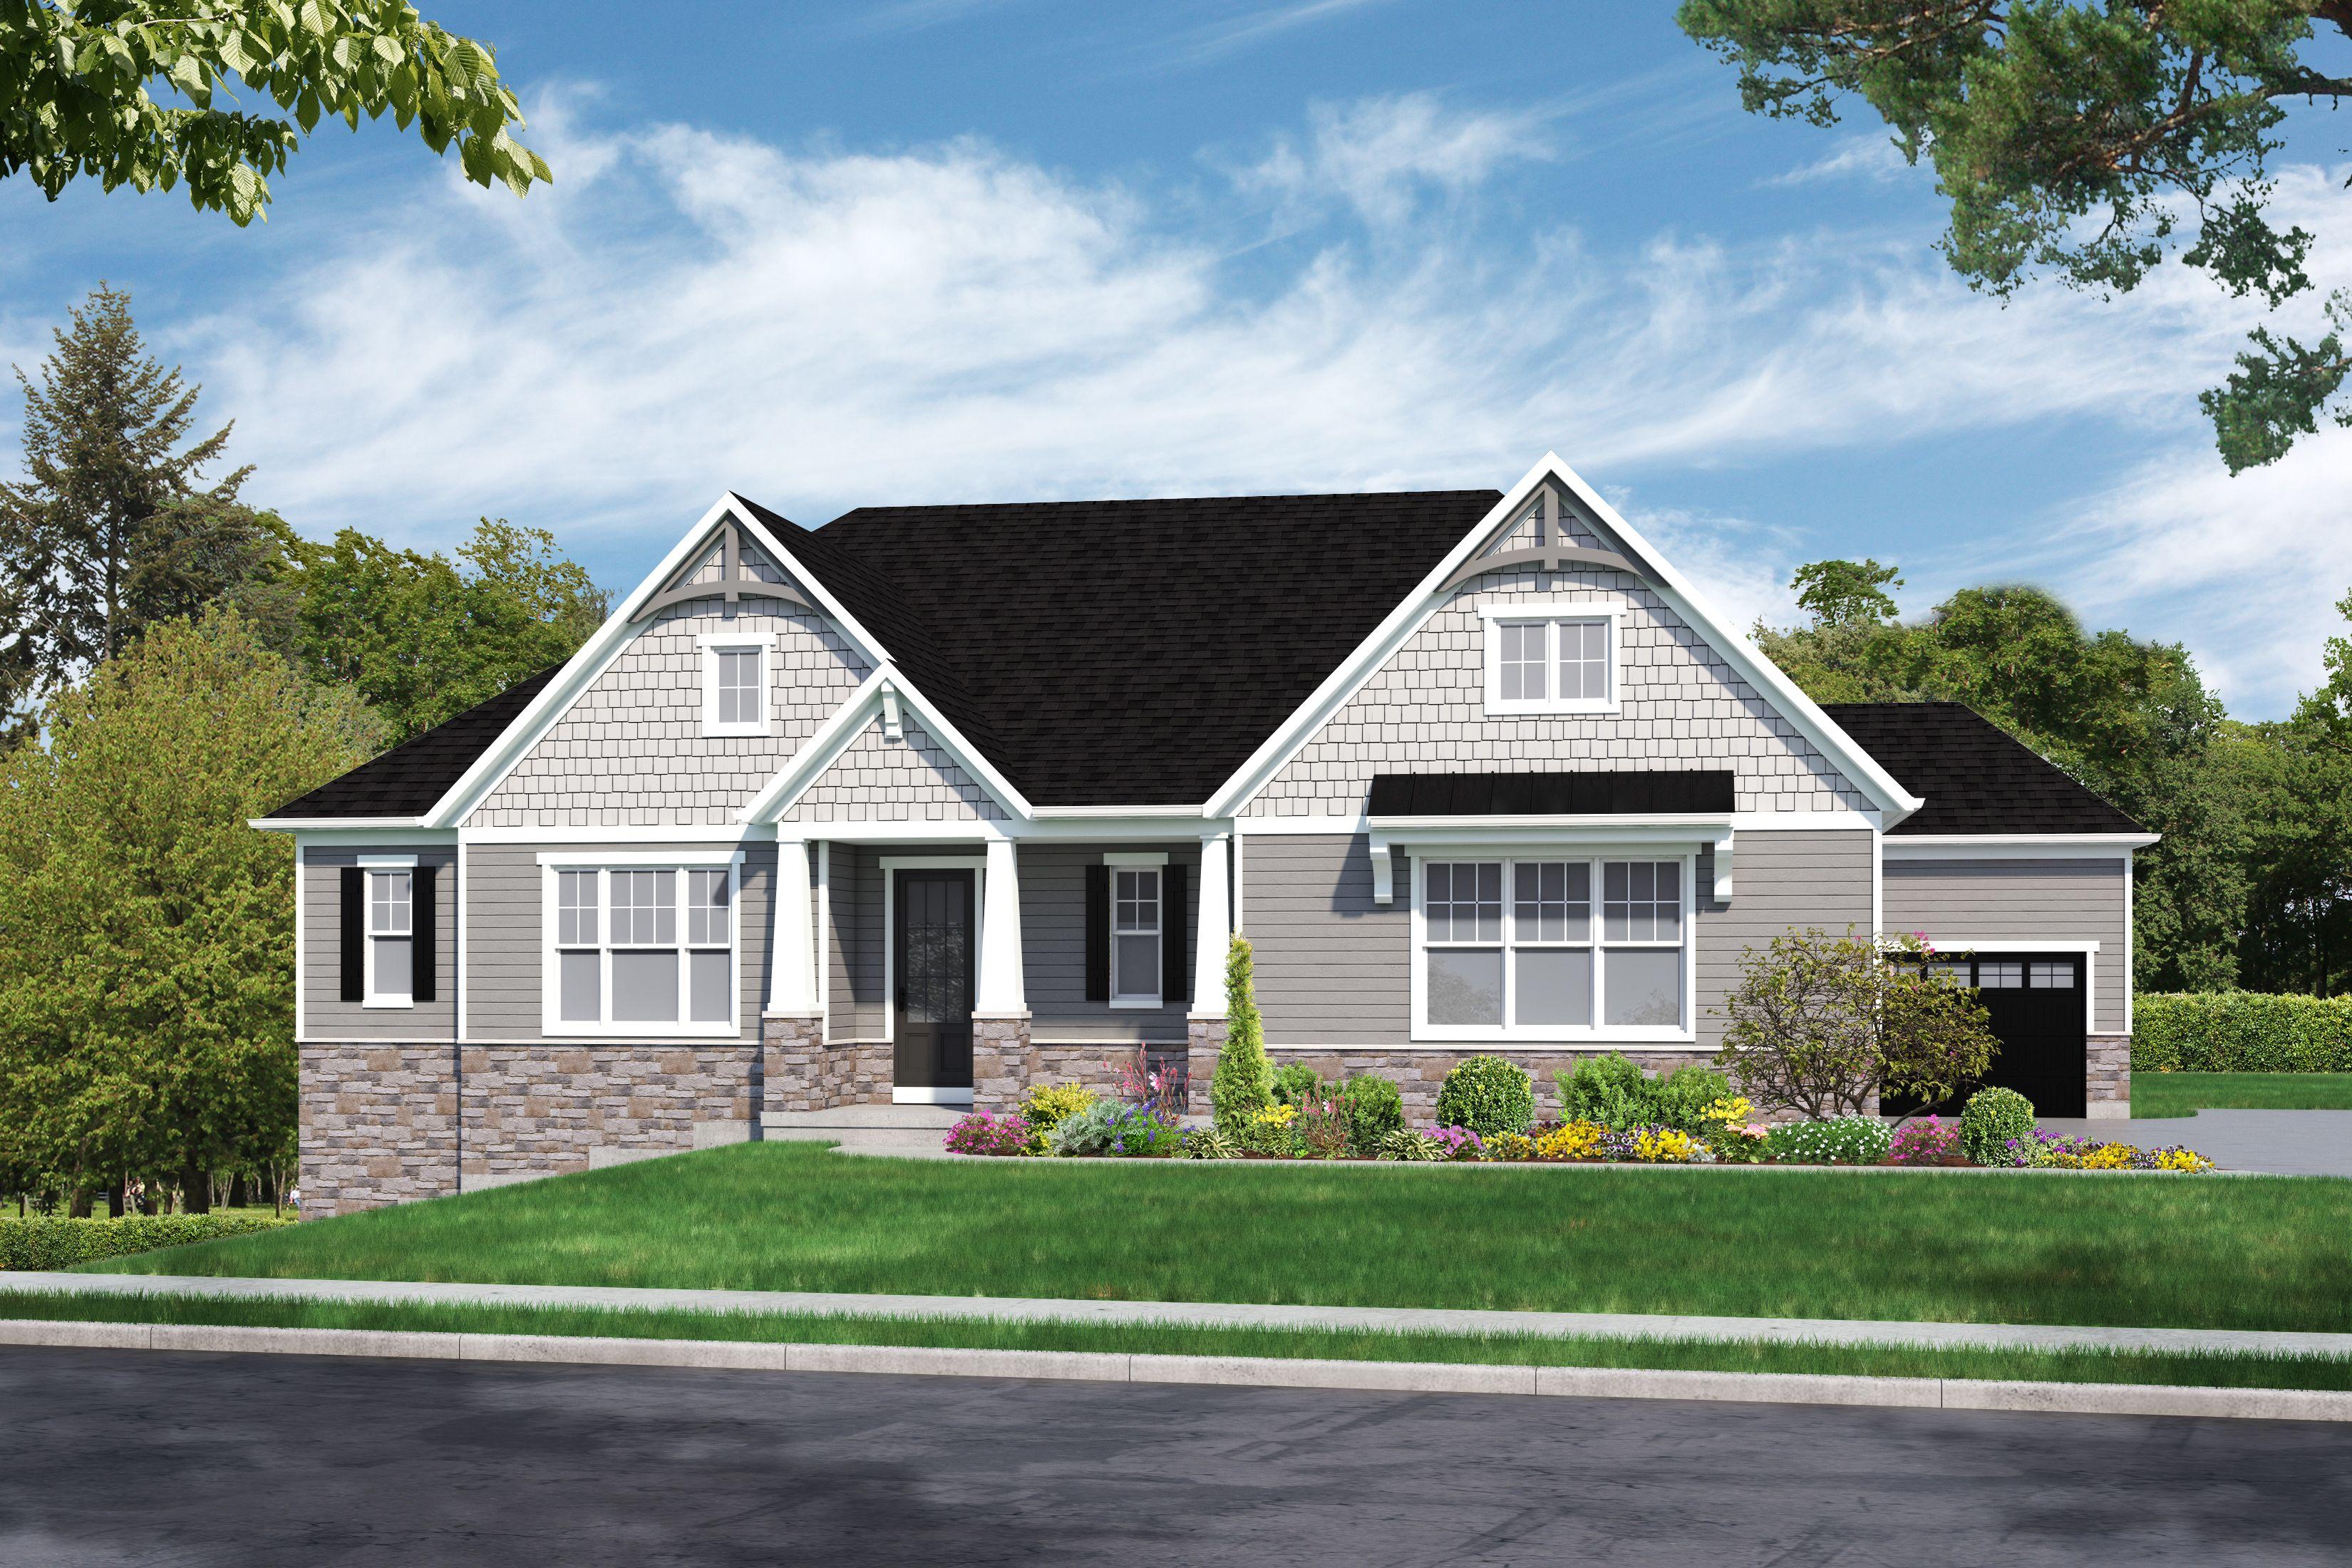 Single Family for Sale at Lyndhurst 1342 Prado Drive Union, Kentucky 41091 United States